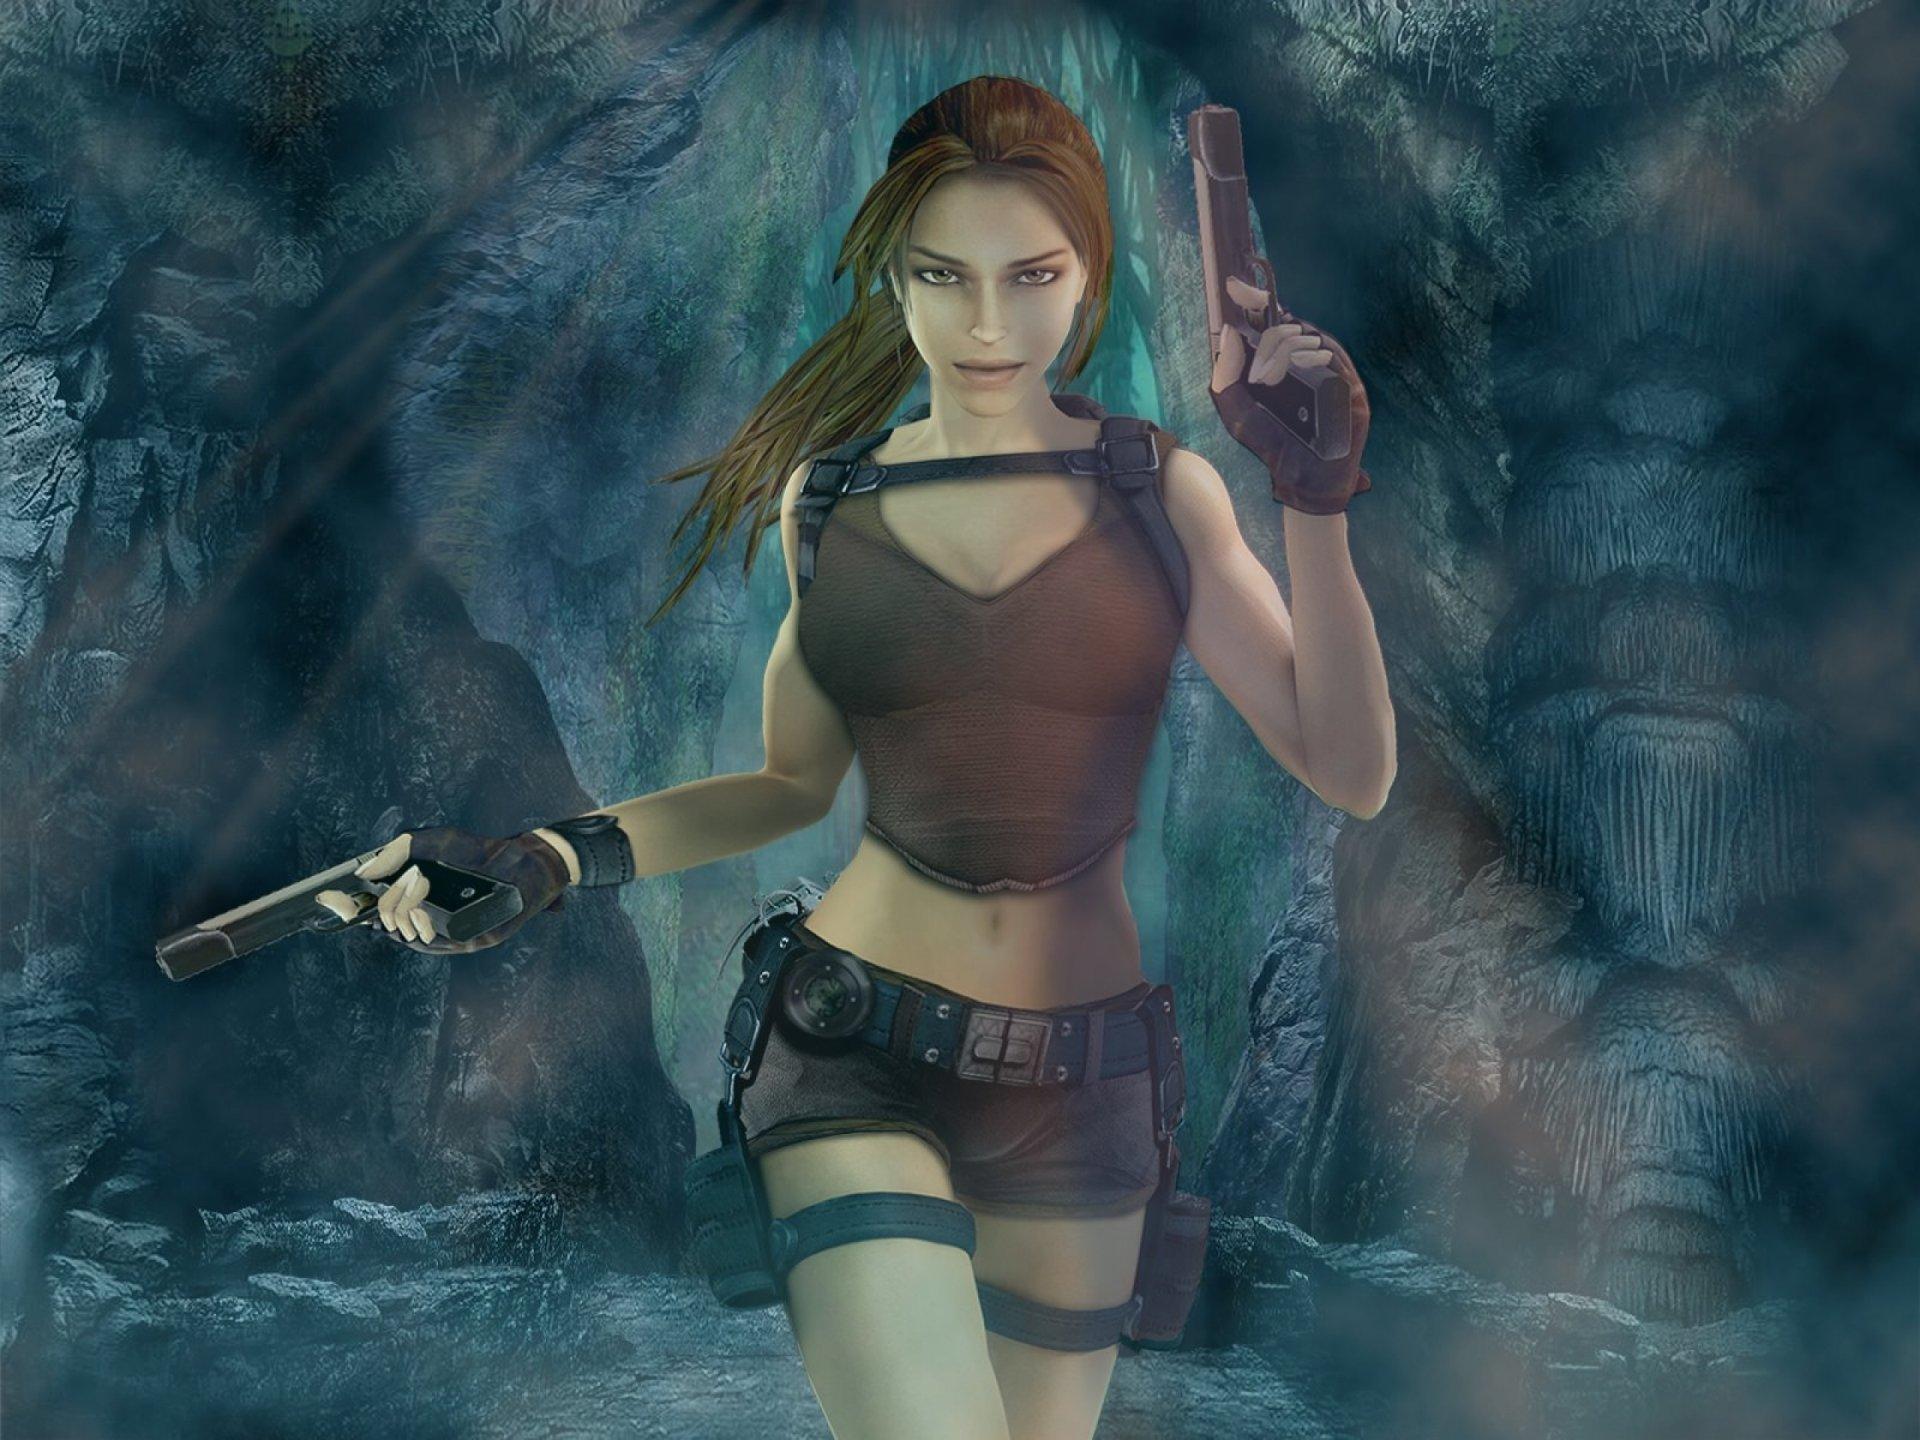 thumb-1920-238137.jpg - Tomb Raider: Underworld